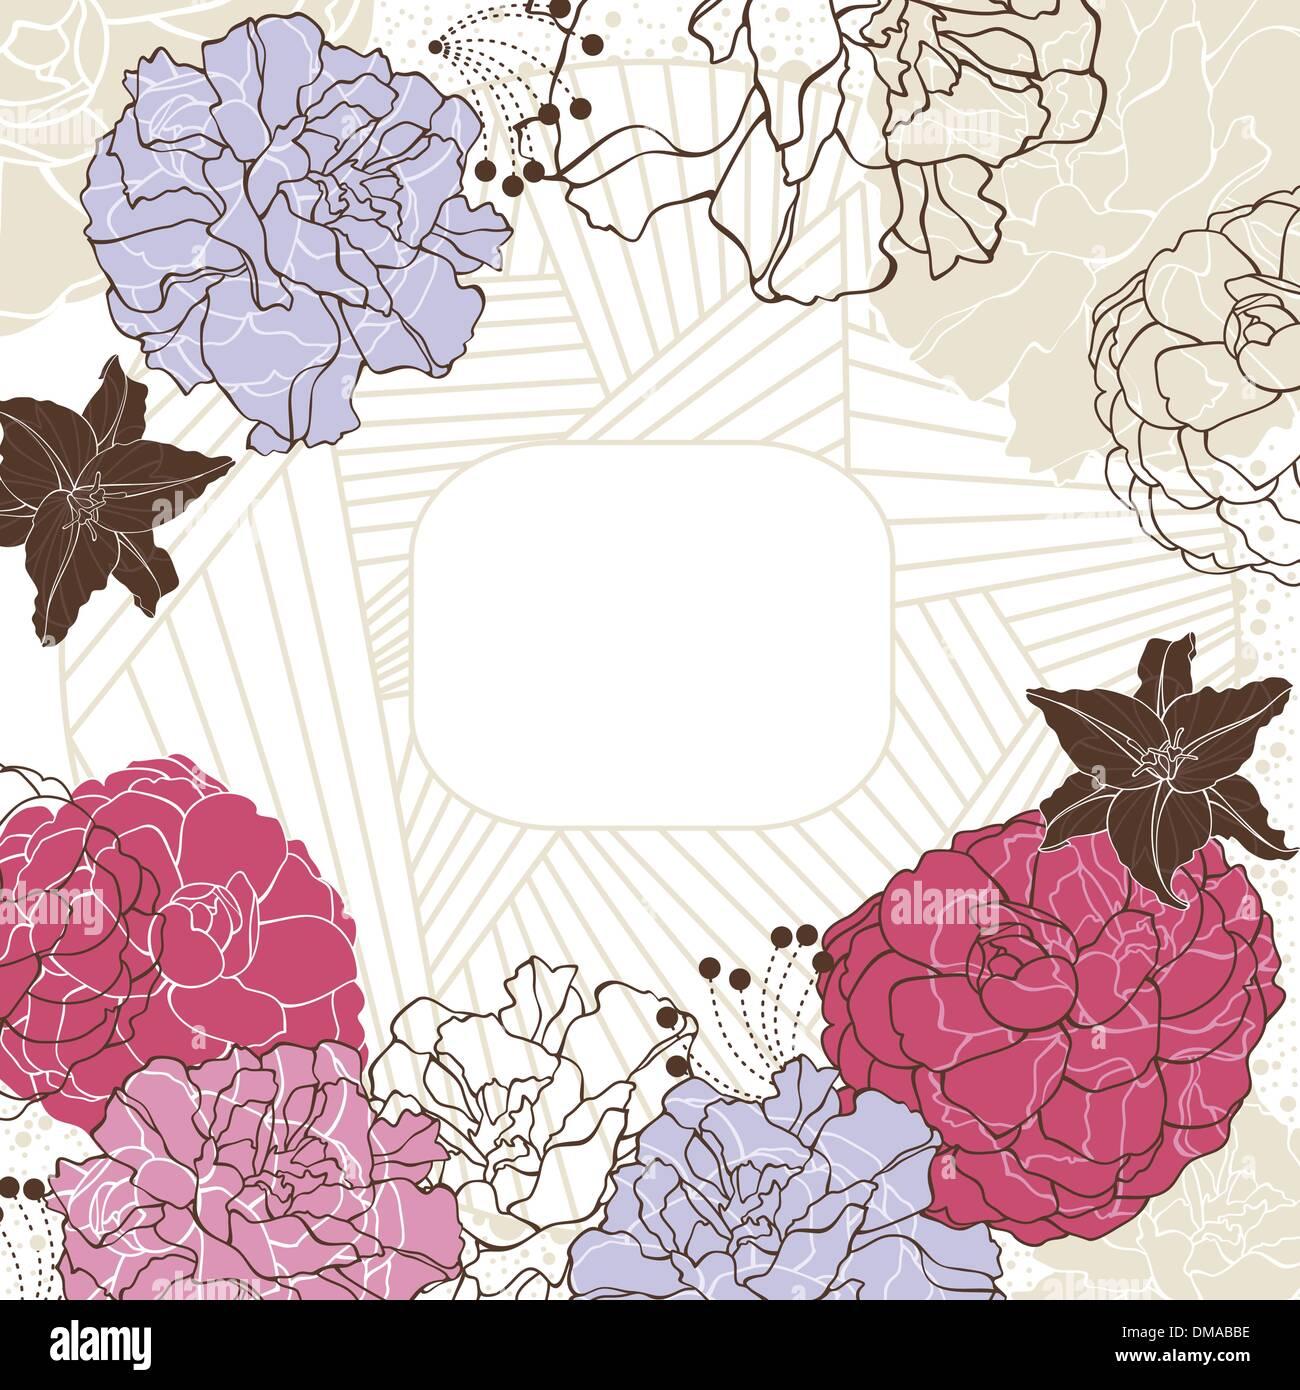 schöne Blumenrahmen Vektor Abbildung - Bild: 64152690 - Alamy